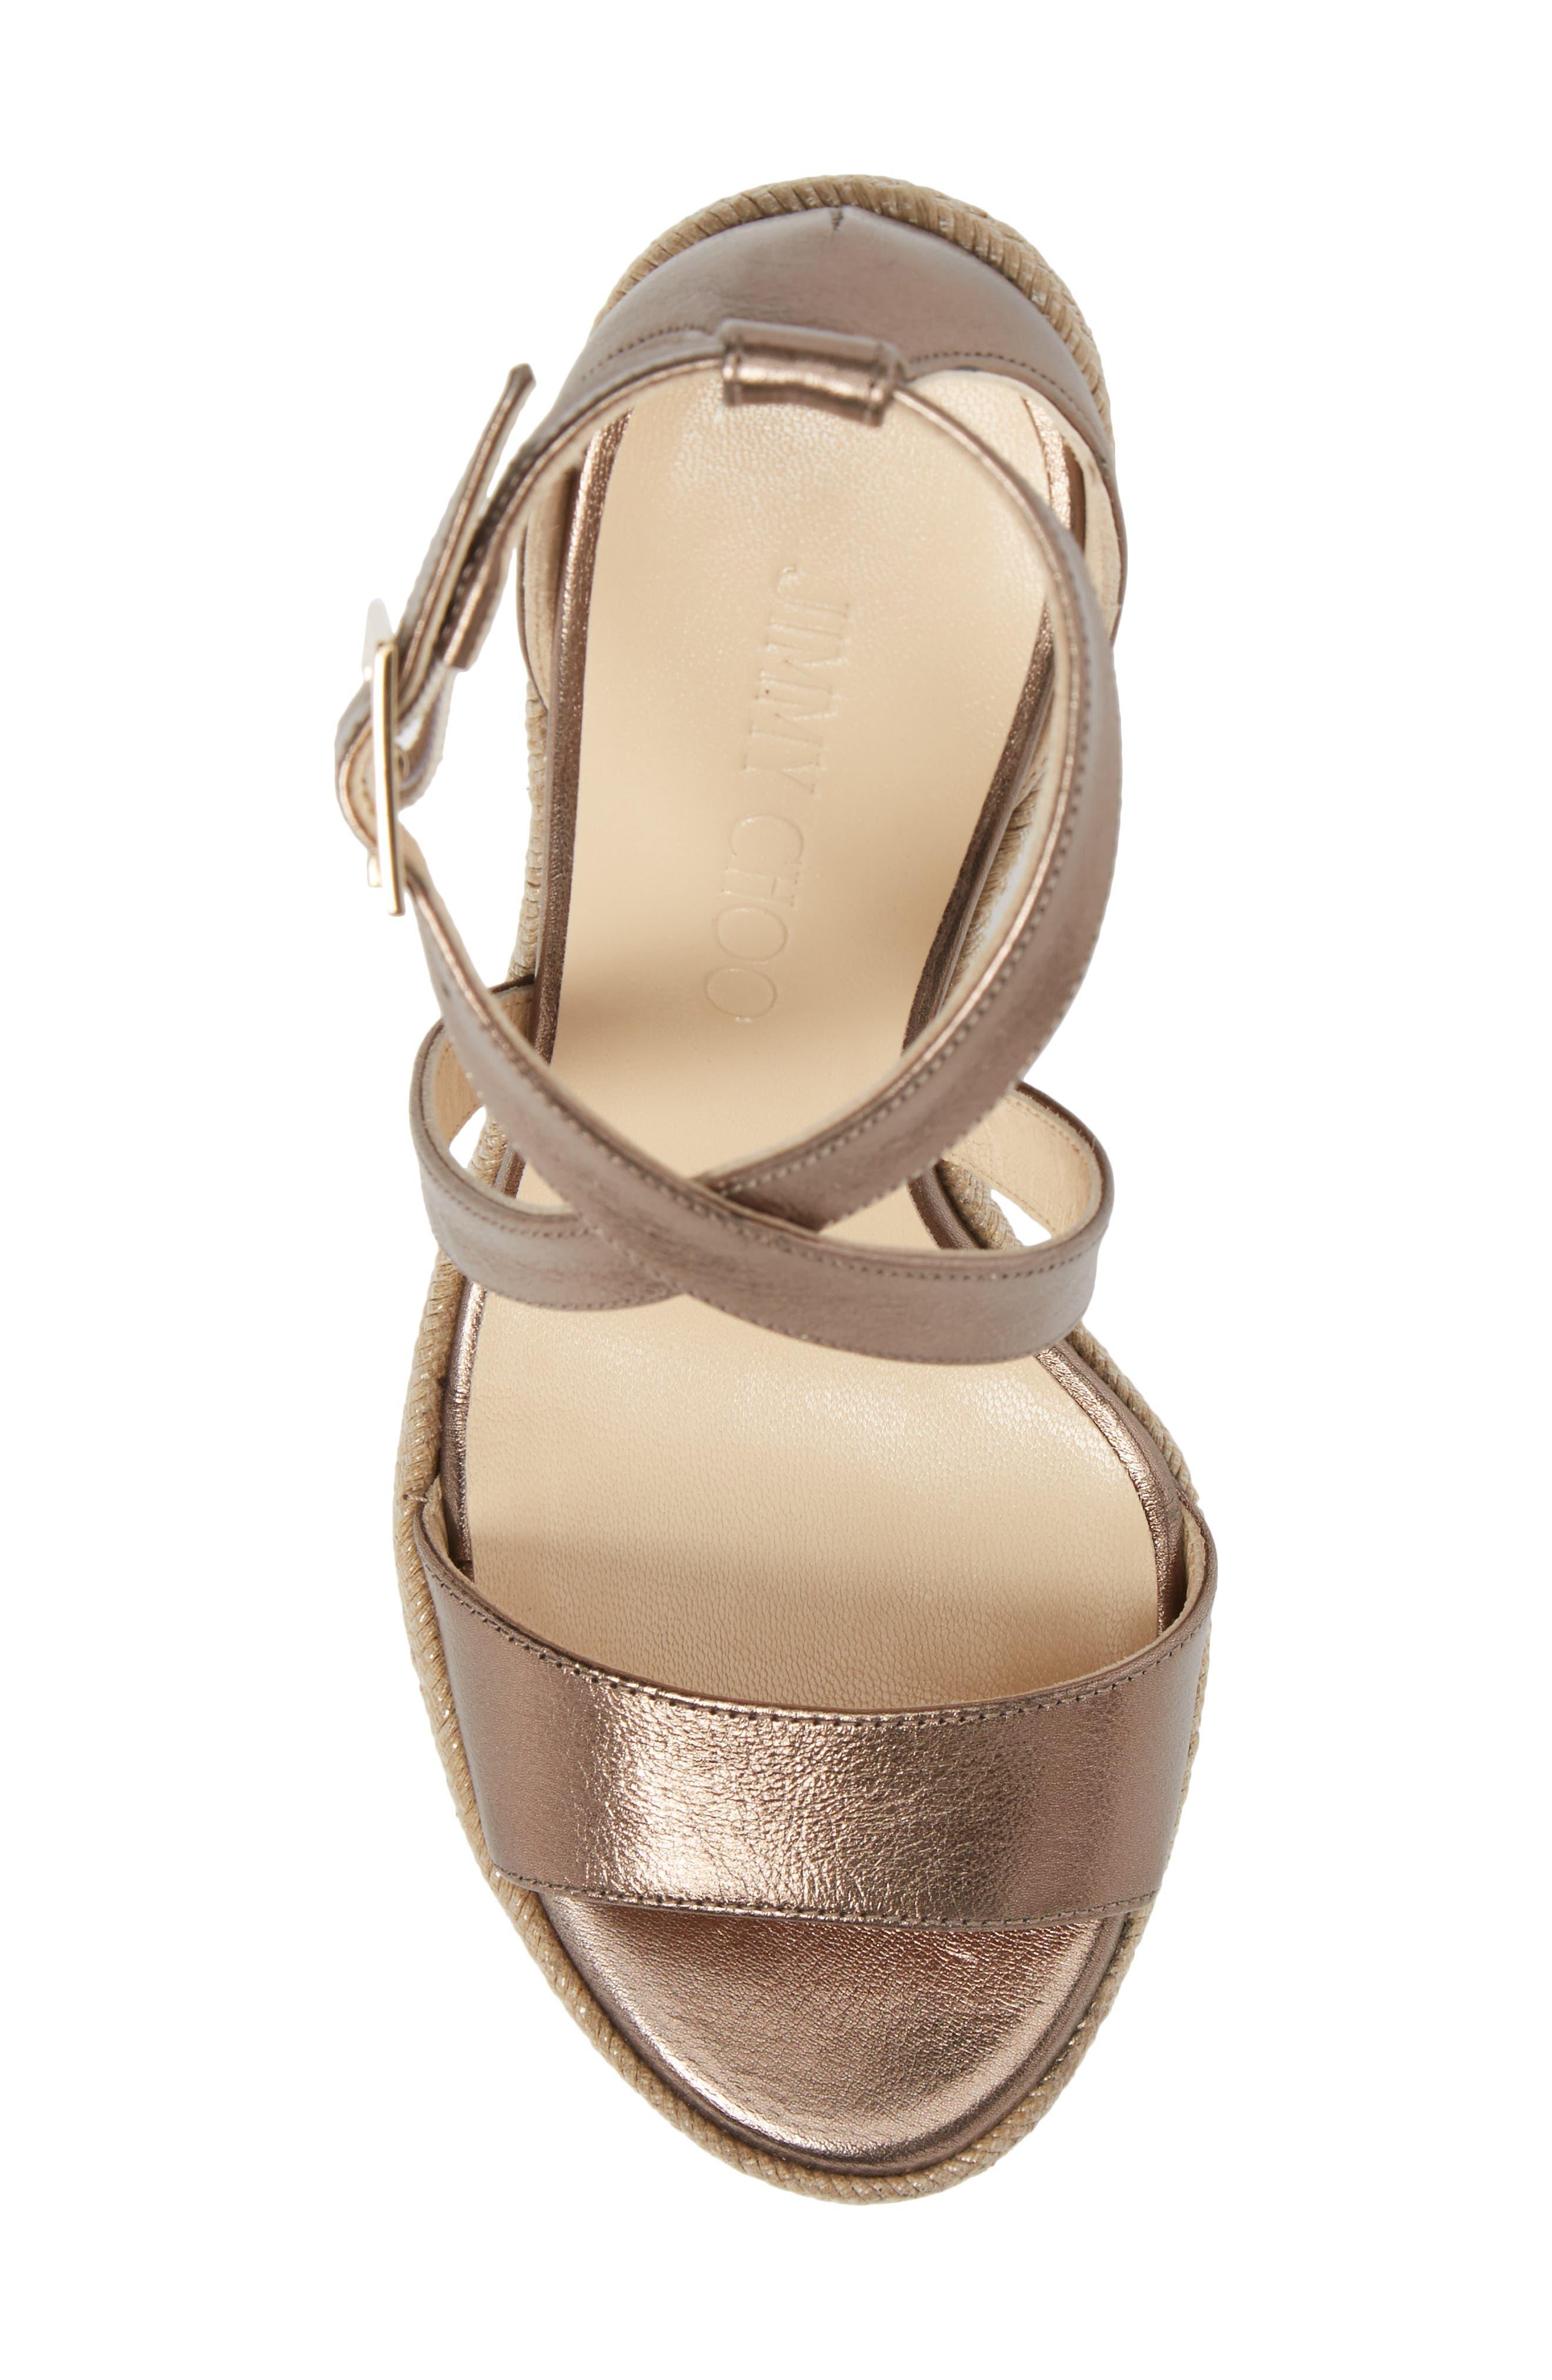 Portia Wedge Platform Sandal,                             Alternate thumbnail 5, color,                             710